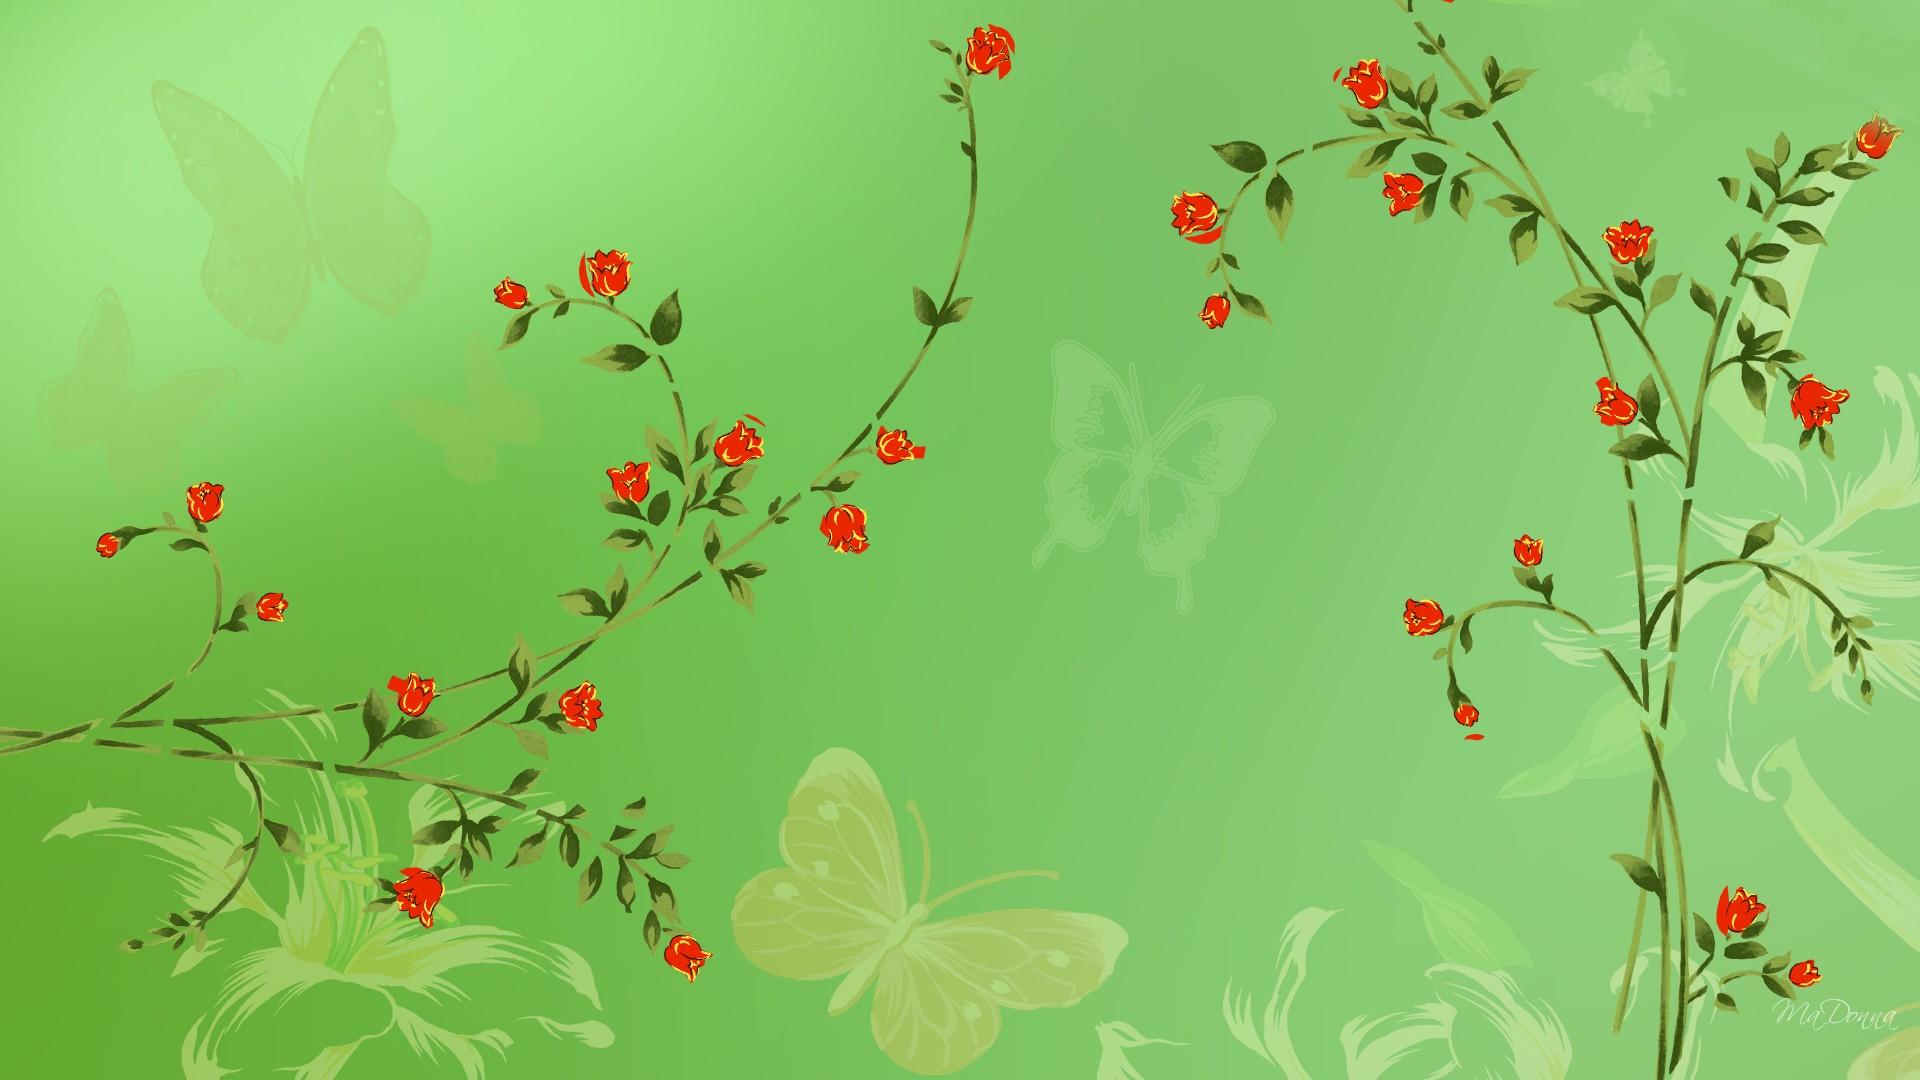 Beautiful Wallpapers 3d Animation Green Leaves Wallpapers Pixelstalk Net